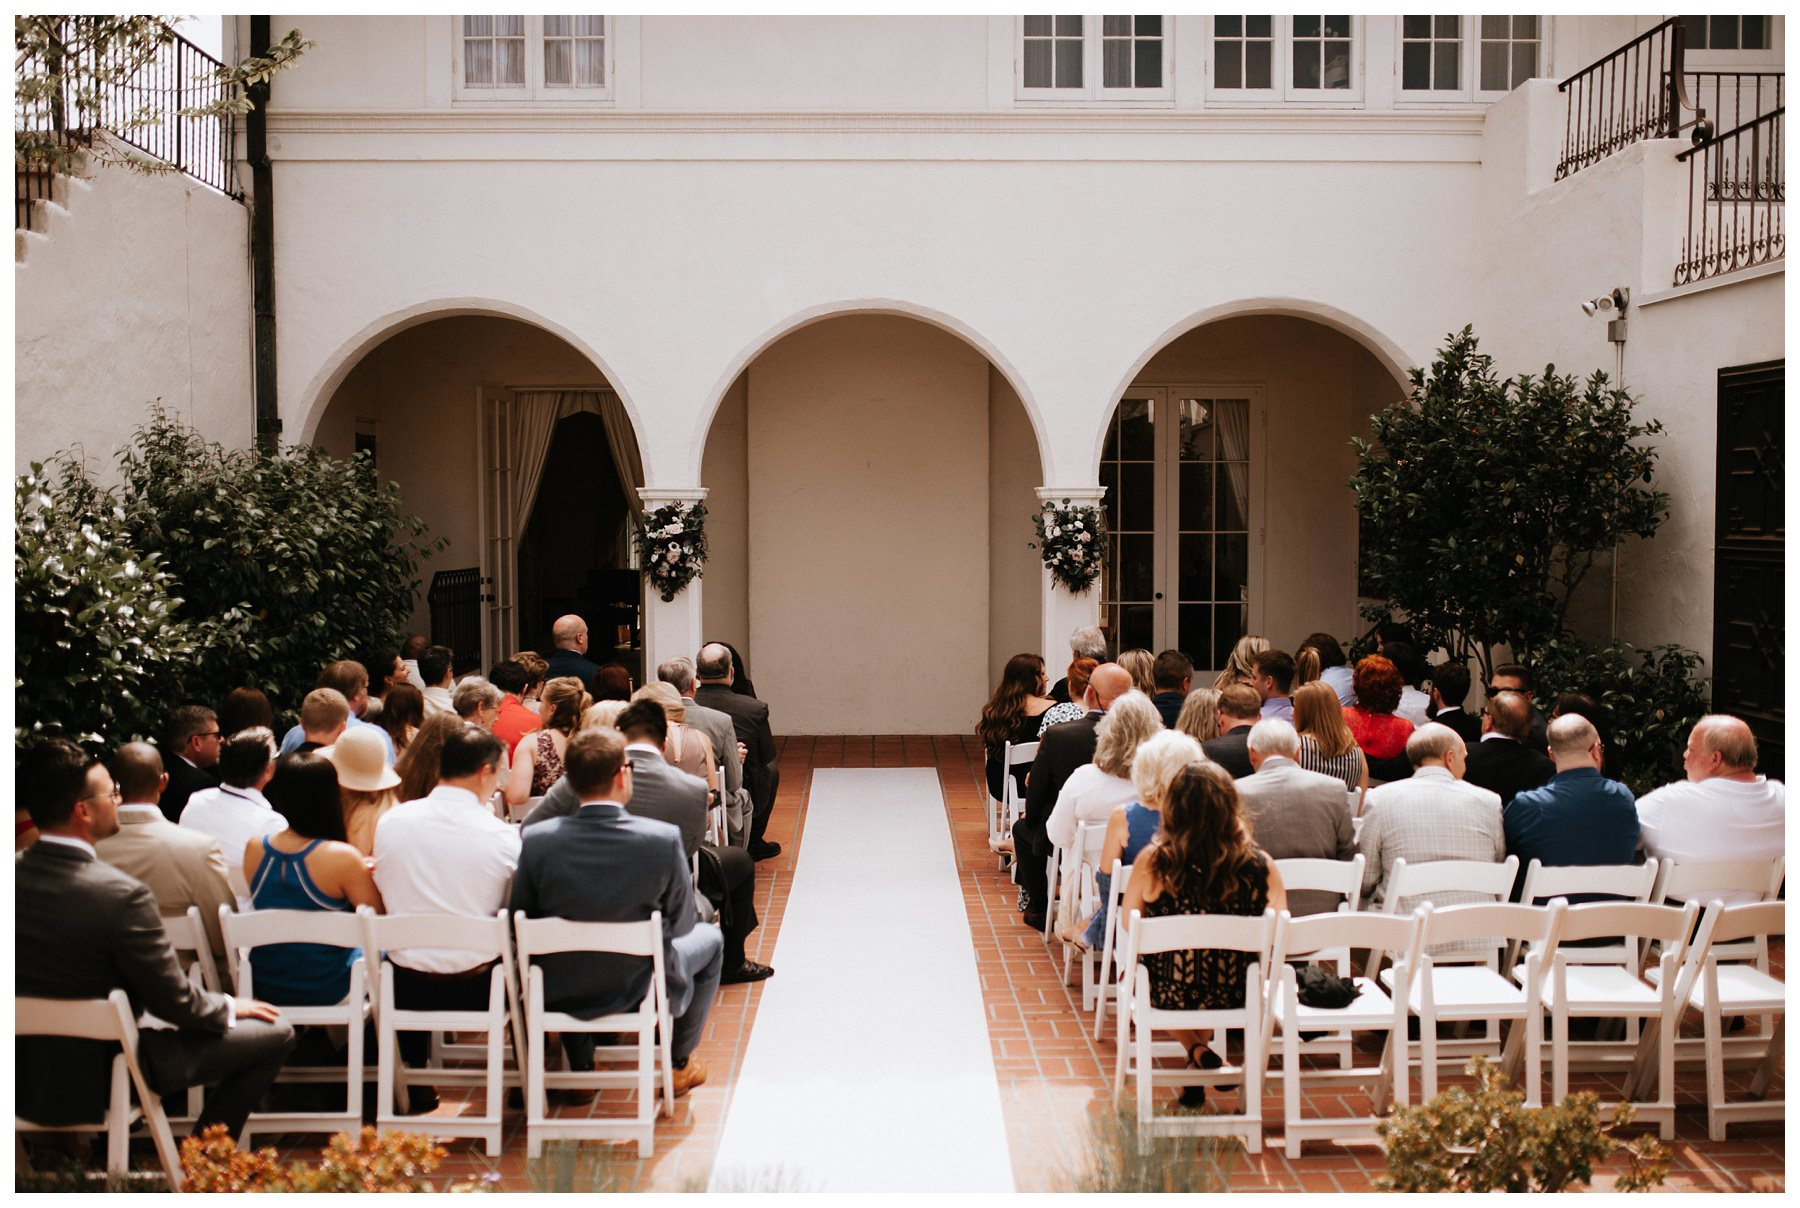 Darlington_House_Wedding_0021.jpg